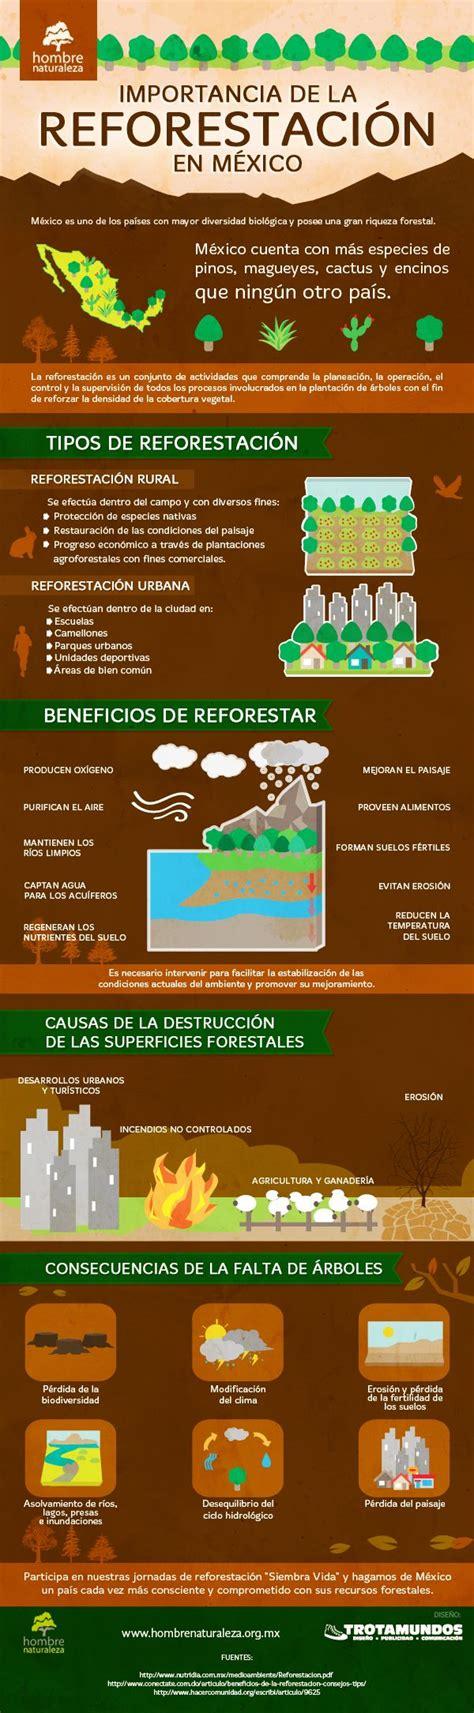 infografia reforestacion cosas  escuela